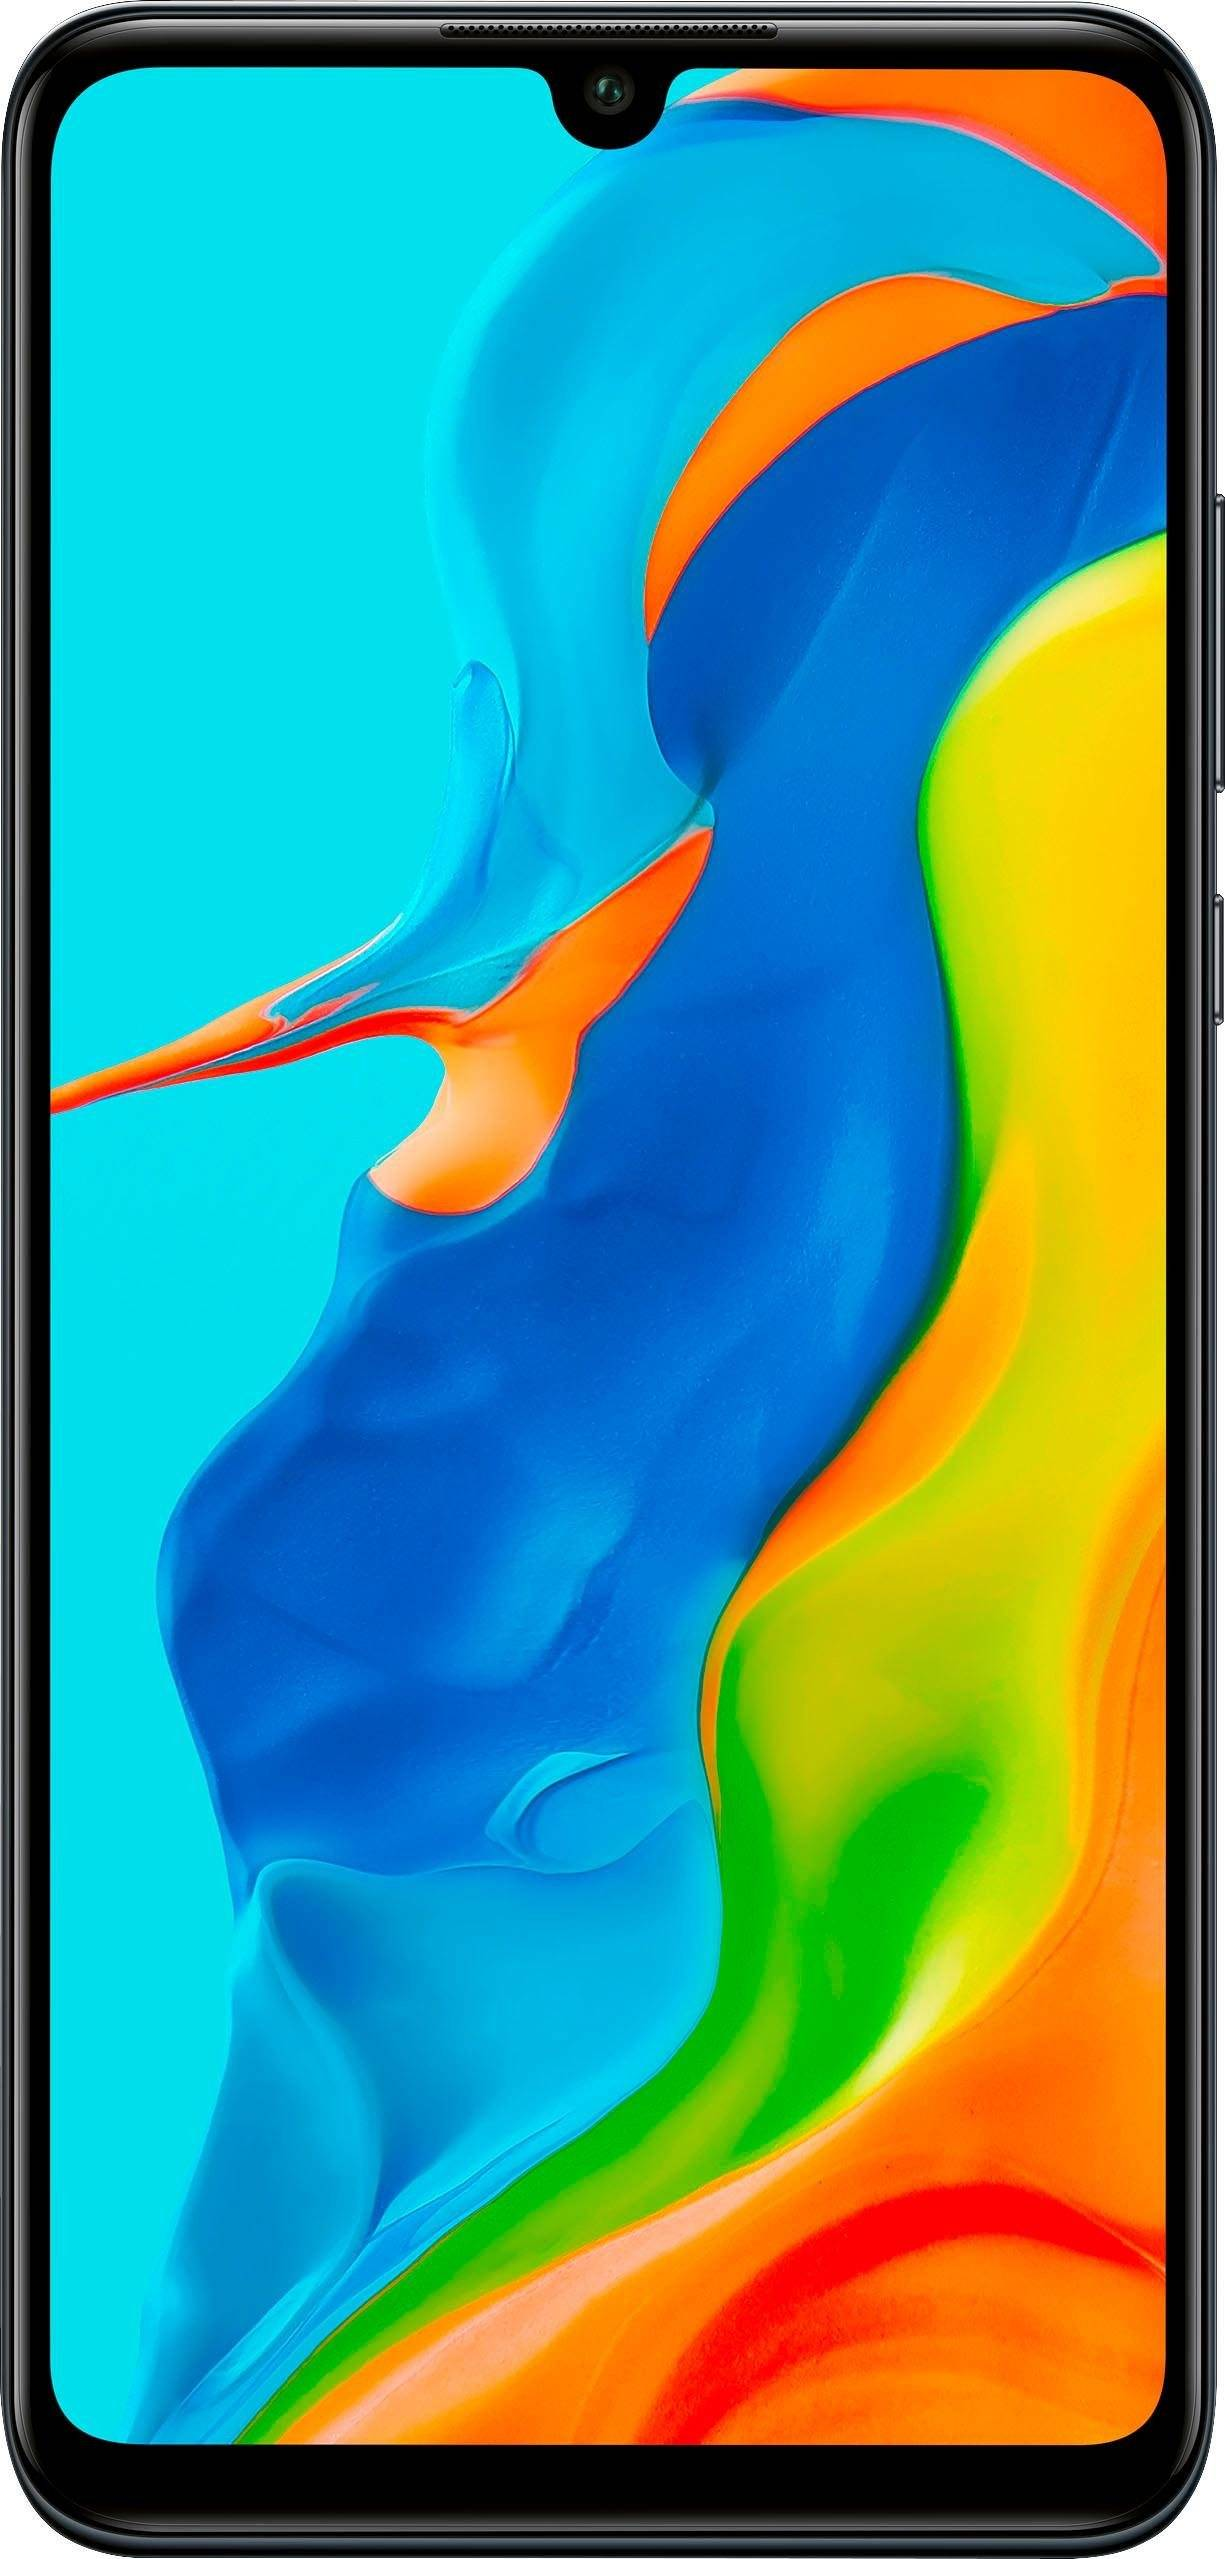 Huawei P30 Lite New Edition Smartphone (15,62 cm/6,15 Zoll, 256 GB Speicherplatz, 48 MP Kamera), midnight black